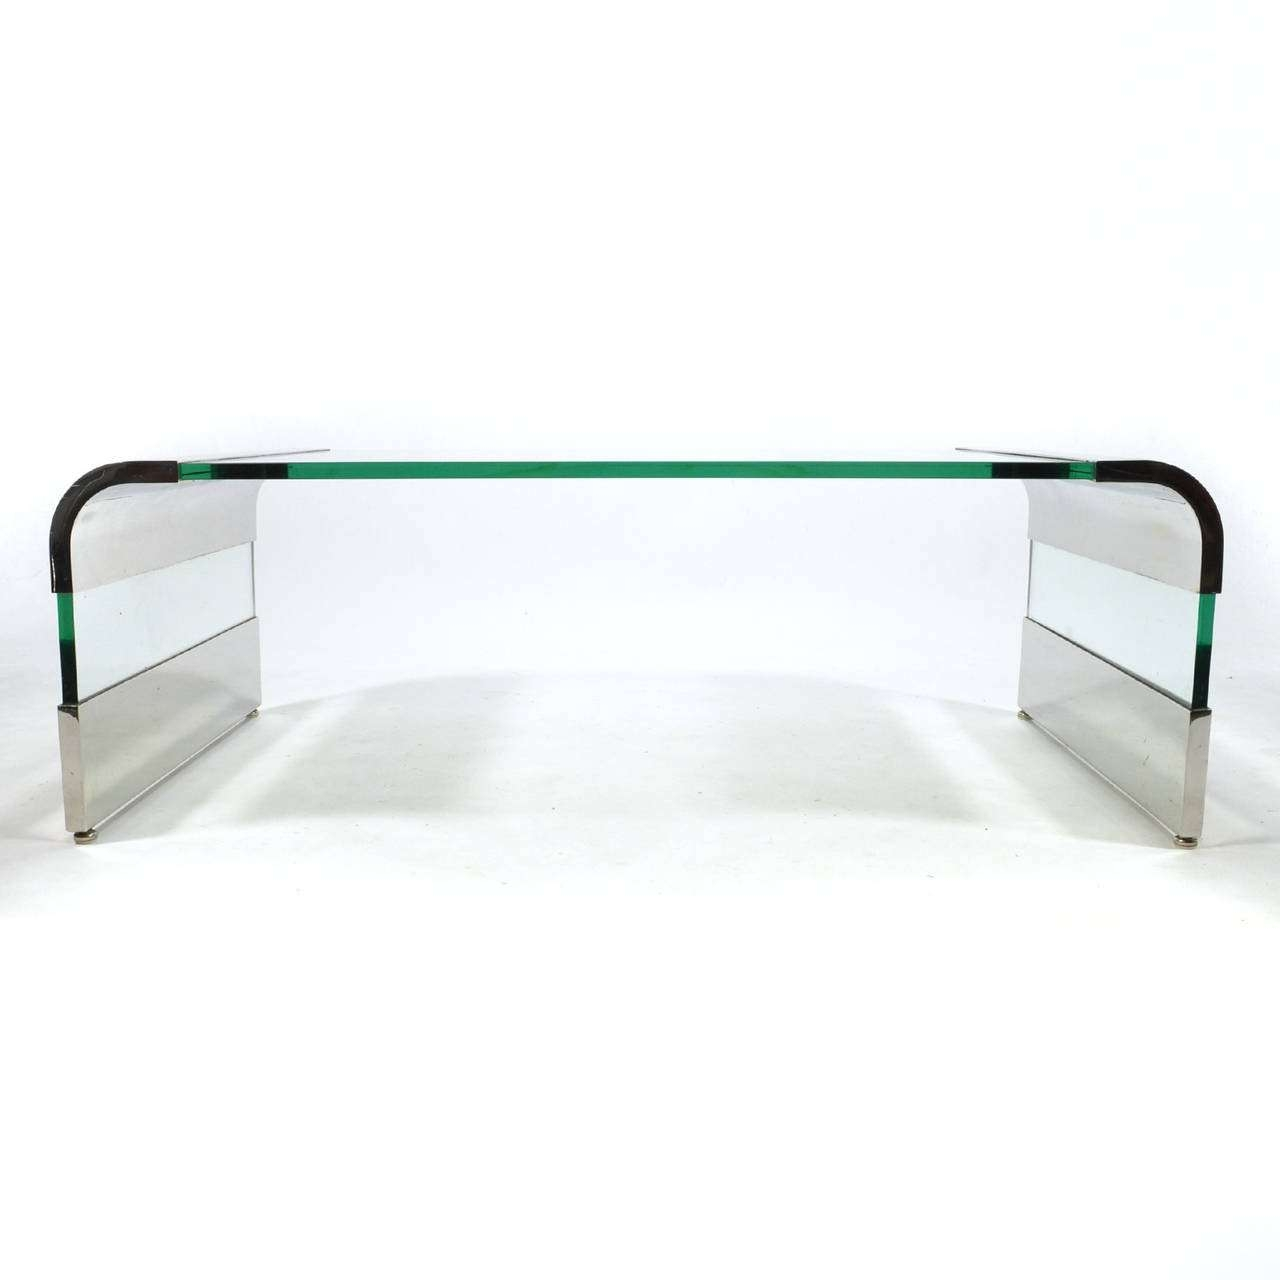 2017 Chrome Glass Coffee Tables Regarding Leon Rosen Chrome And Glass Waterfall Coffee Tablepace For (View 19 of 20)